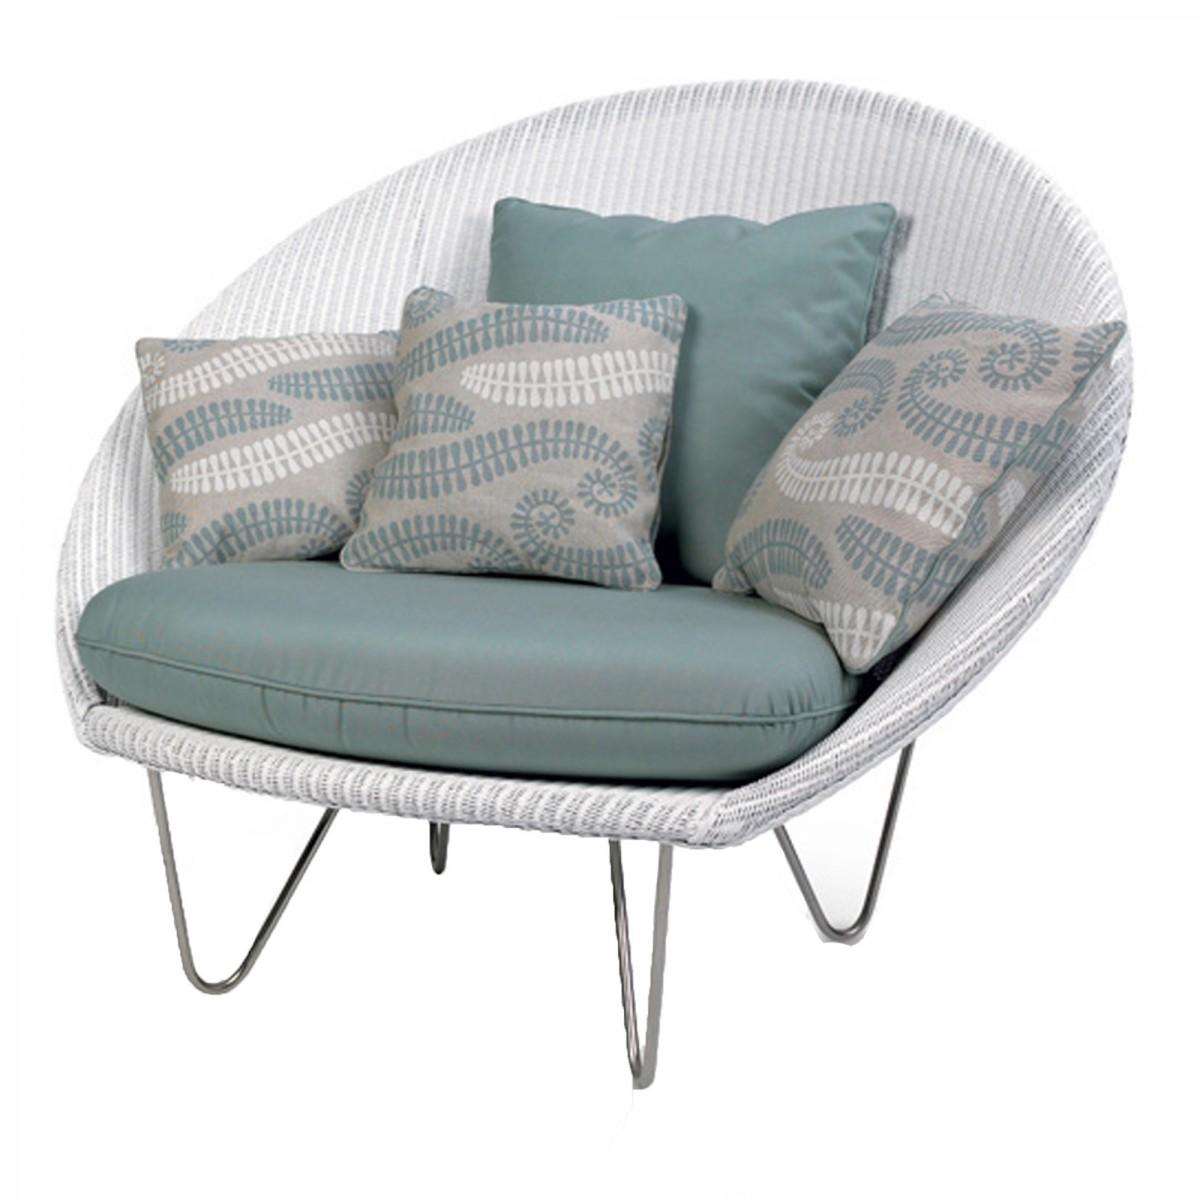 fauteuil gigi lounge vincent sheppard. Black Bedroom Furniture Sets. Home Design Ideas